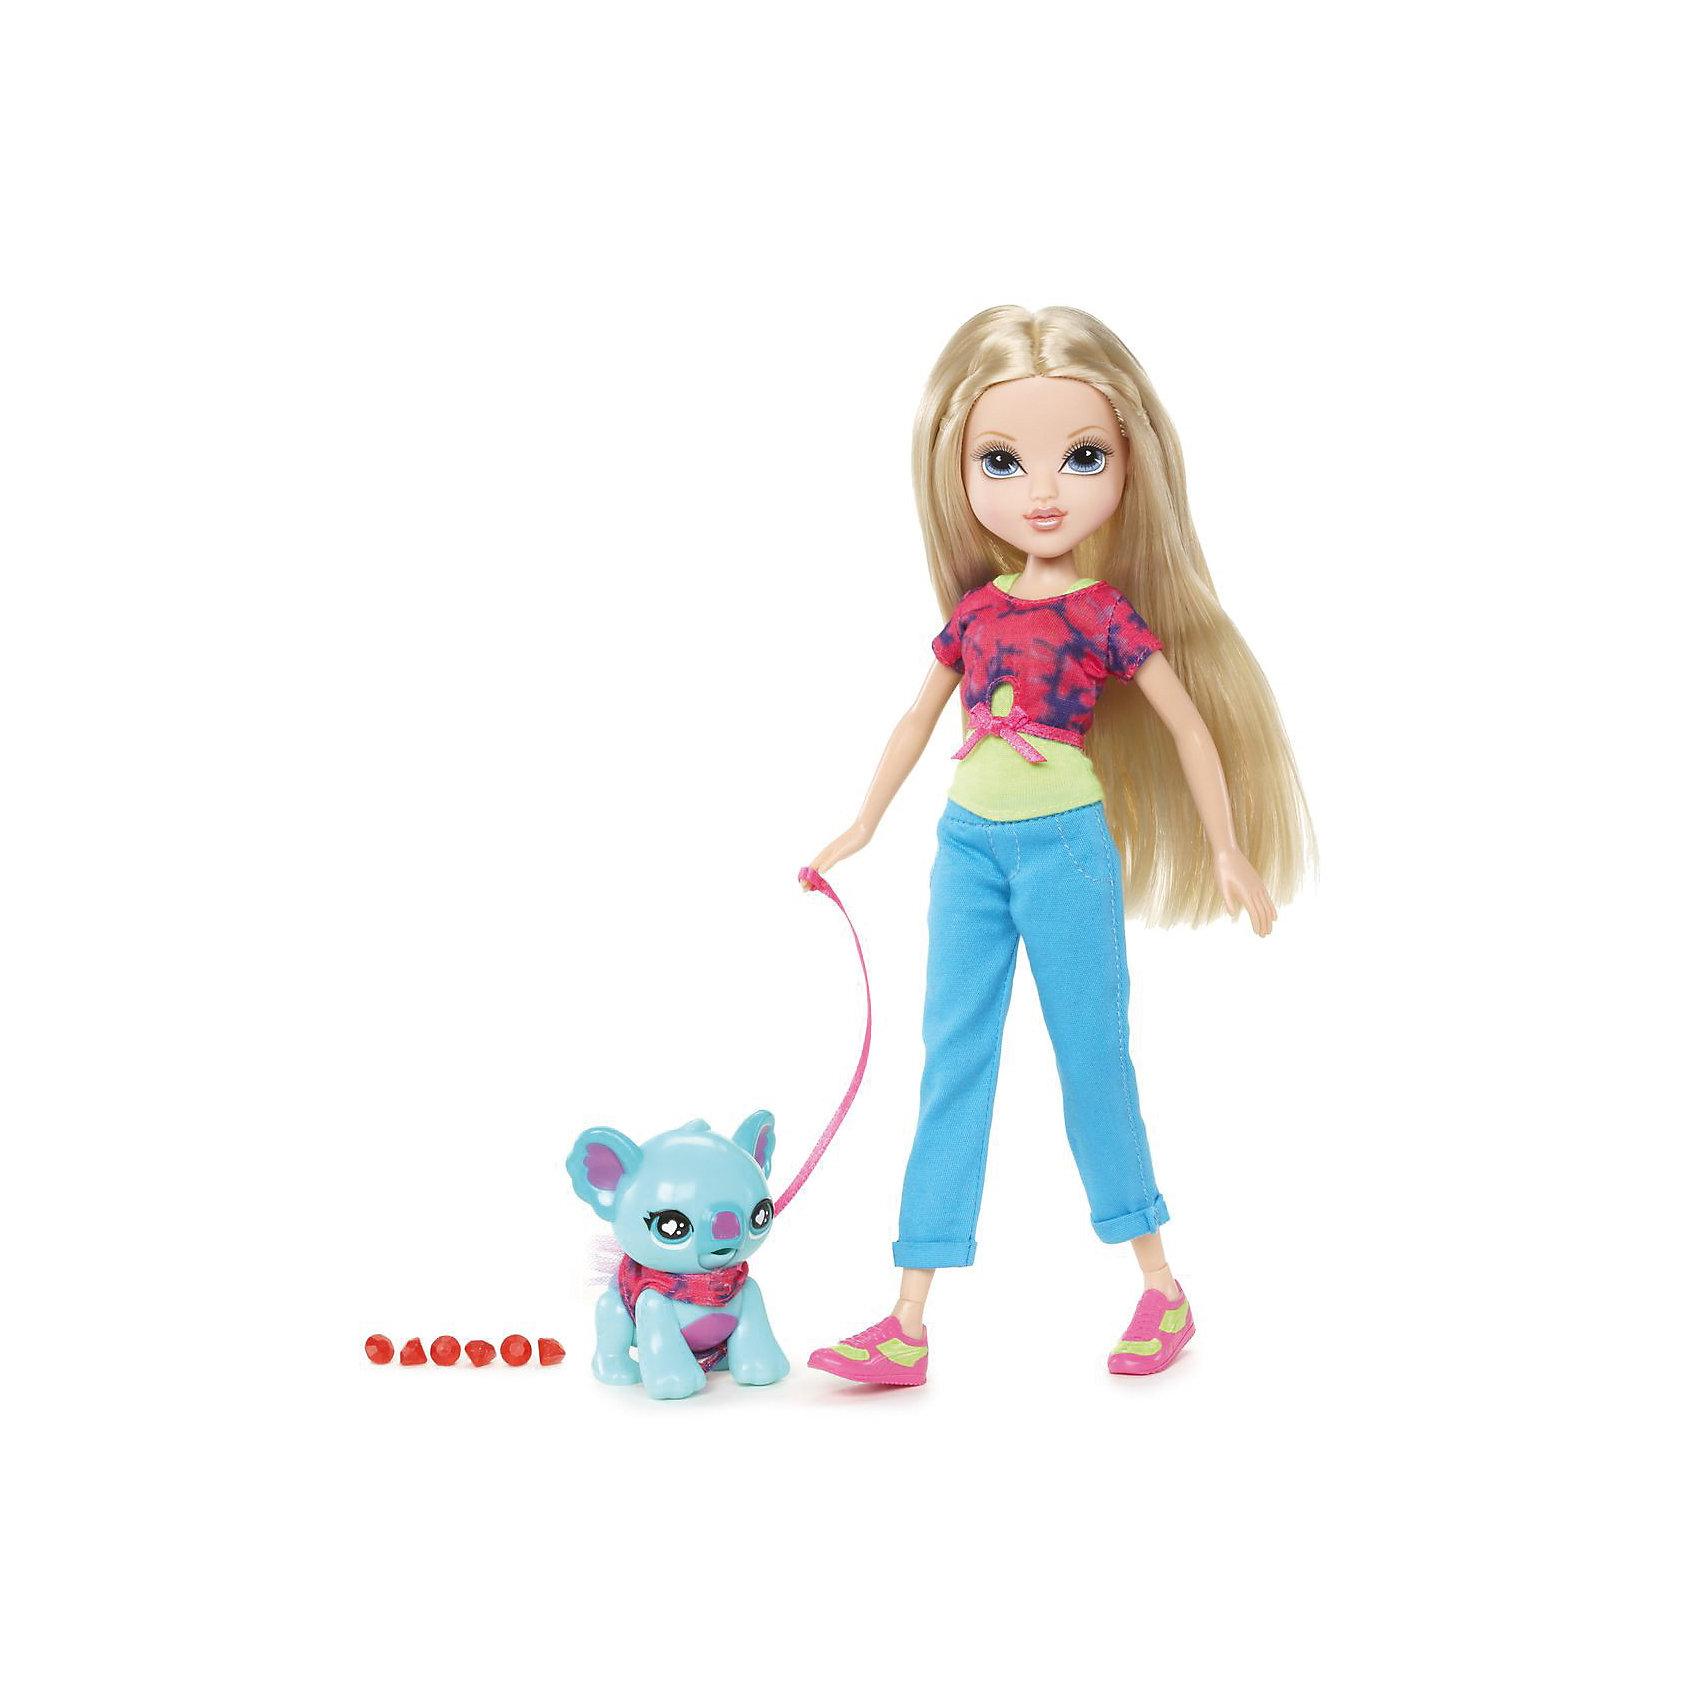 Moxie кукла С питомцем, Эйвери+Медвежонок